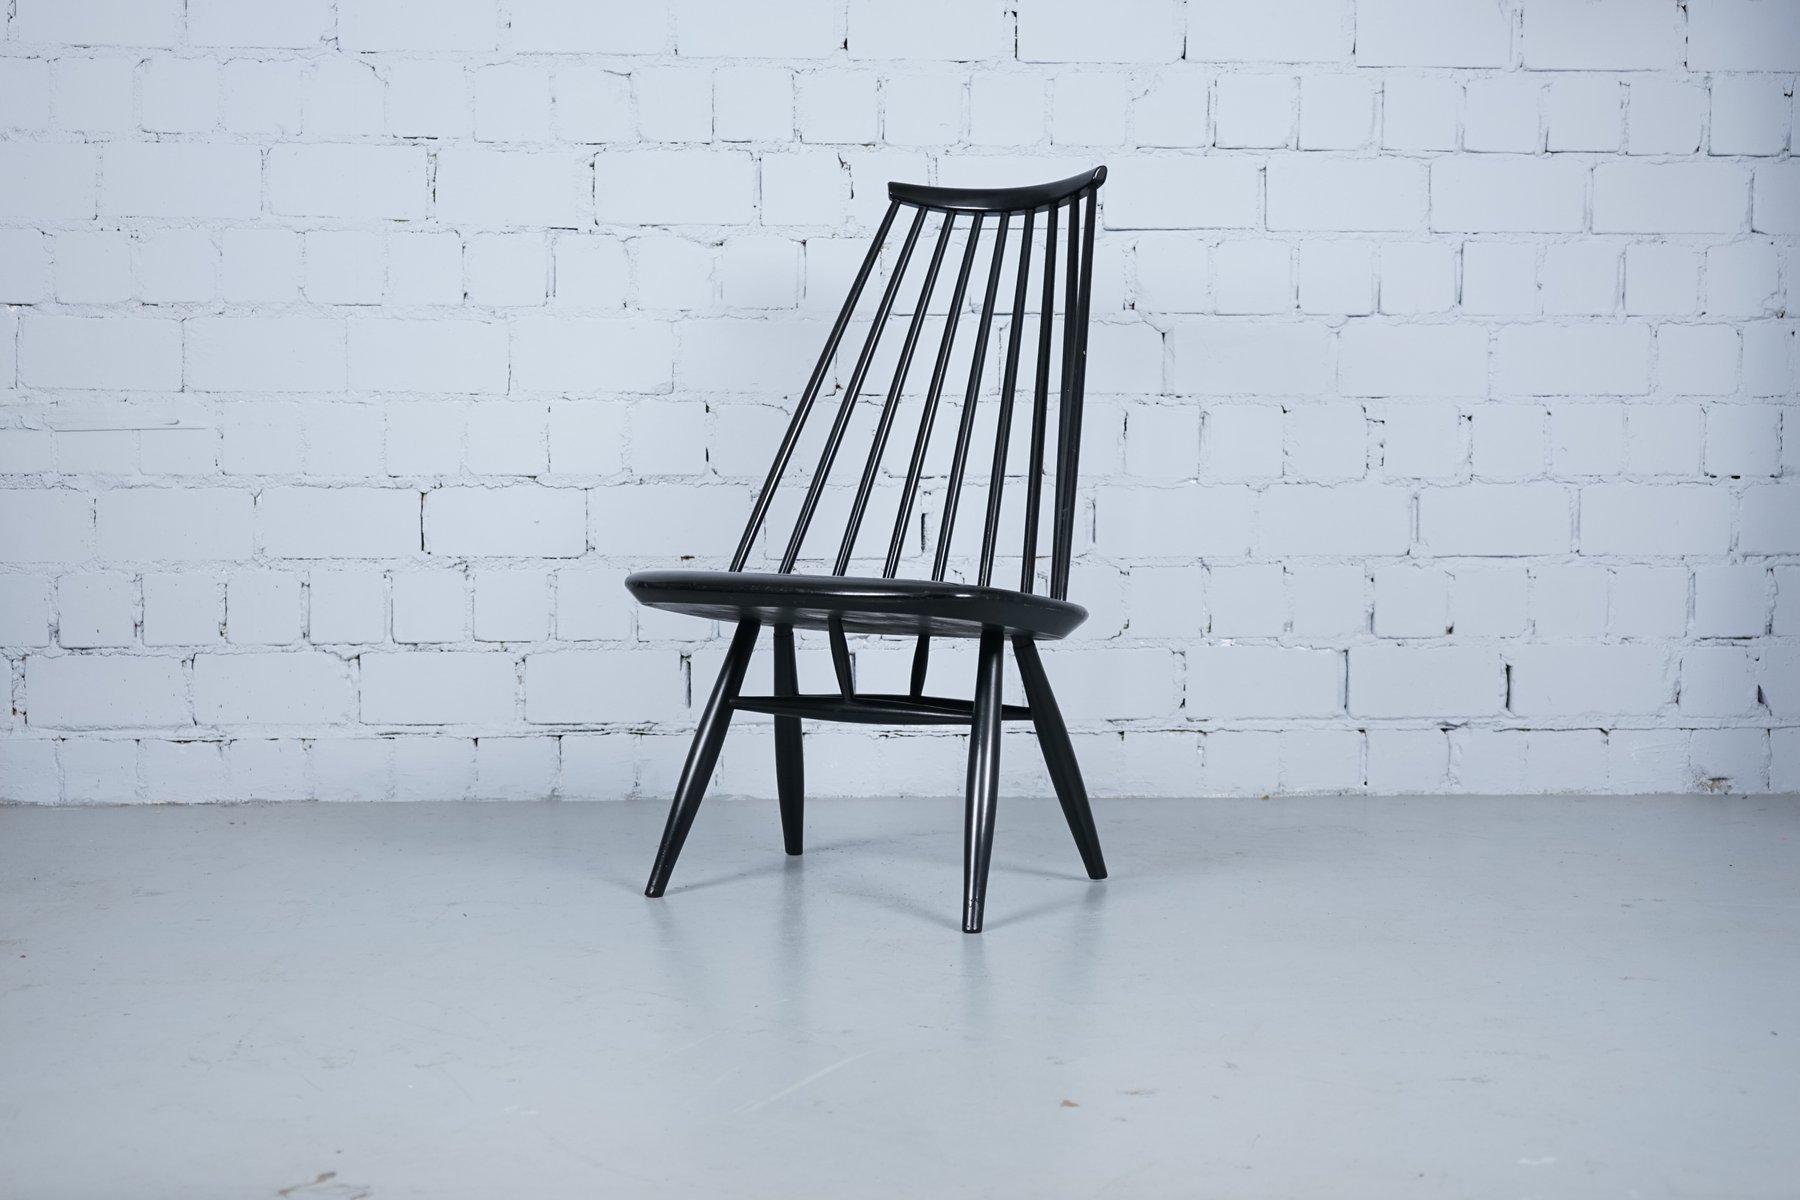 schwarze mademoiselle st hle von ilmari tapiovaara f r. Black Bedroom Furniture Sets. Home Design Ideas